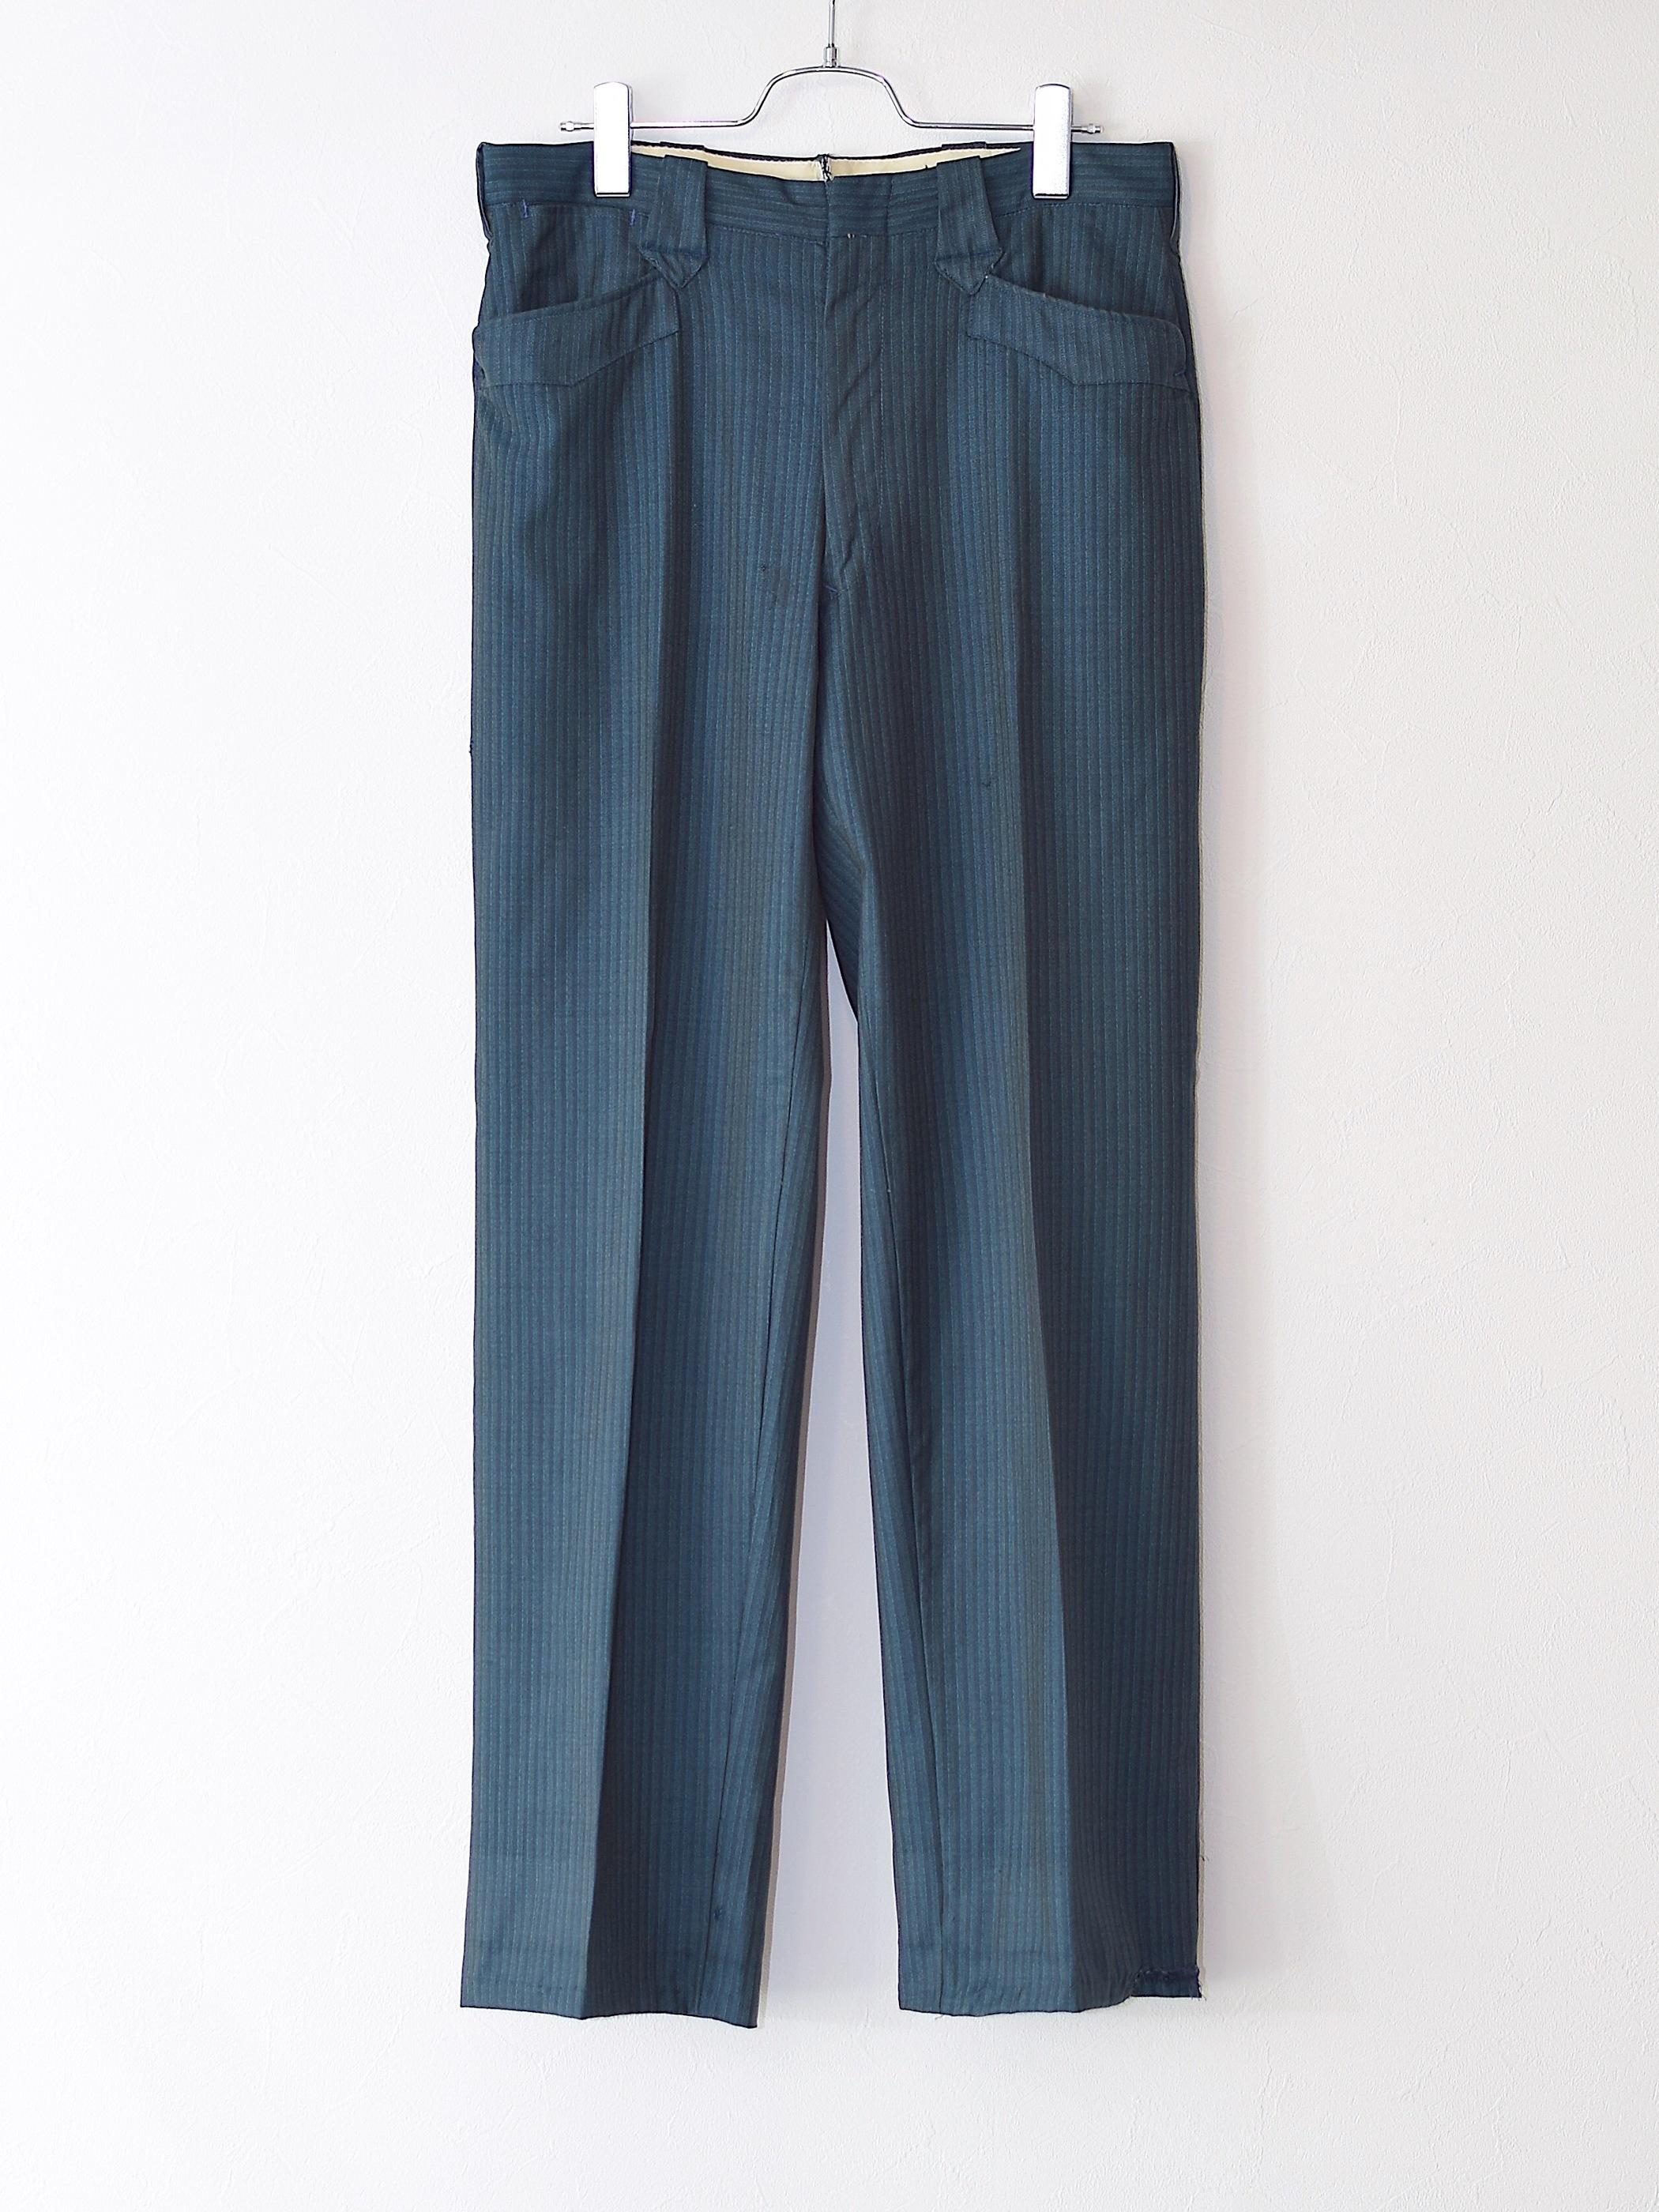 Vintage 50's【HBARC】Western Pants